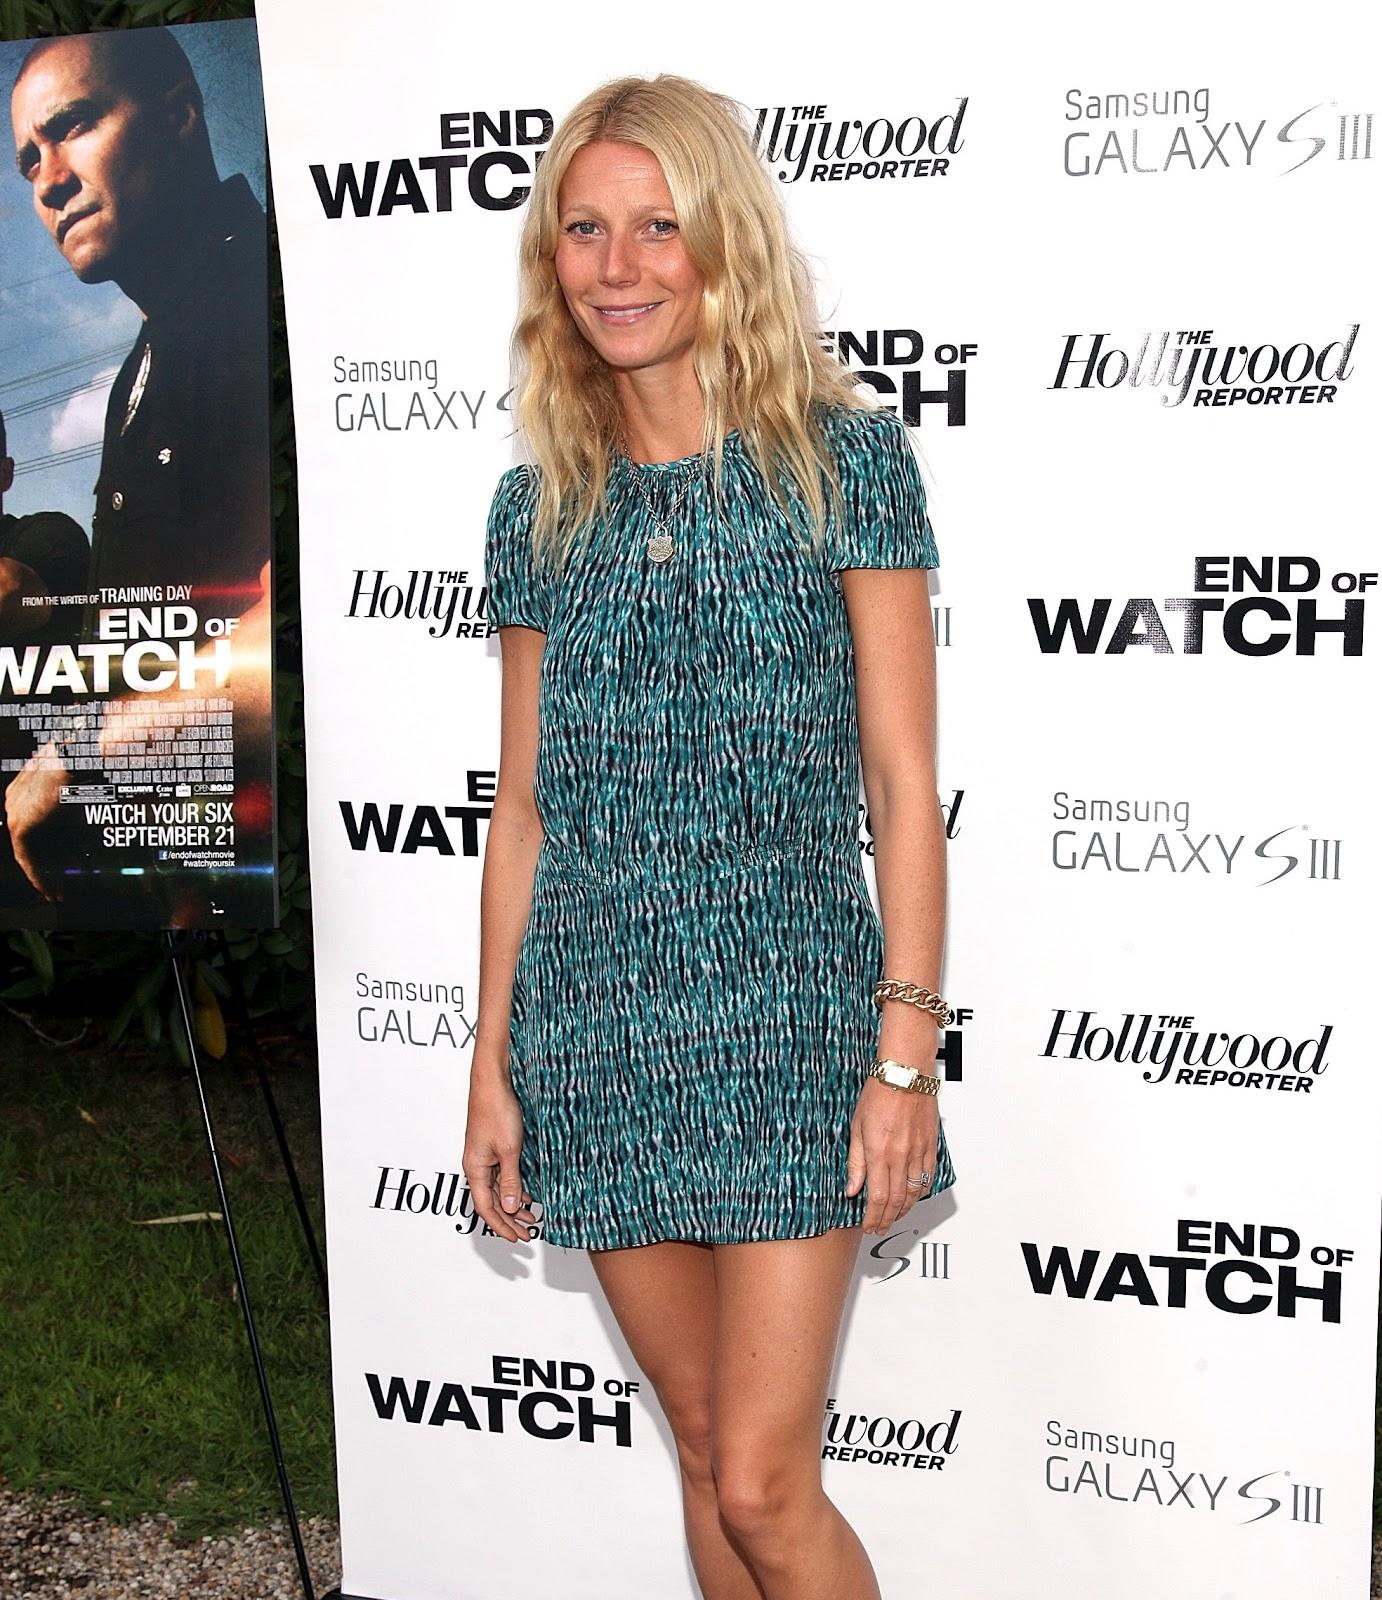 http://1.bp.blogspot.com/-FcQuZbsoOrg/UDI1z_0uHlI/AAAAAAAAMZo/yewJl4A0gEU/s1600/Gwyneth+Paltrow+attends+END+OF+WATCH+Screening+in+NY.jpg